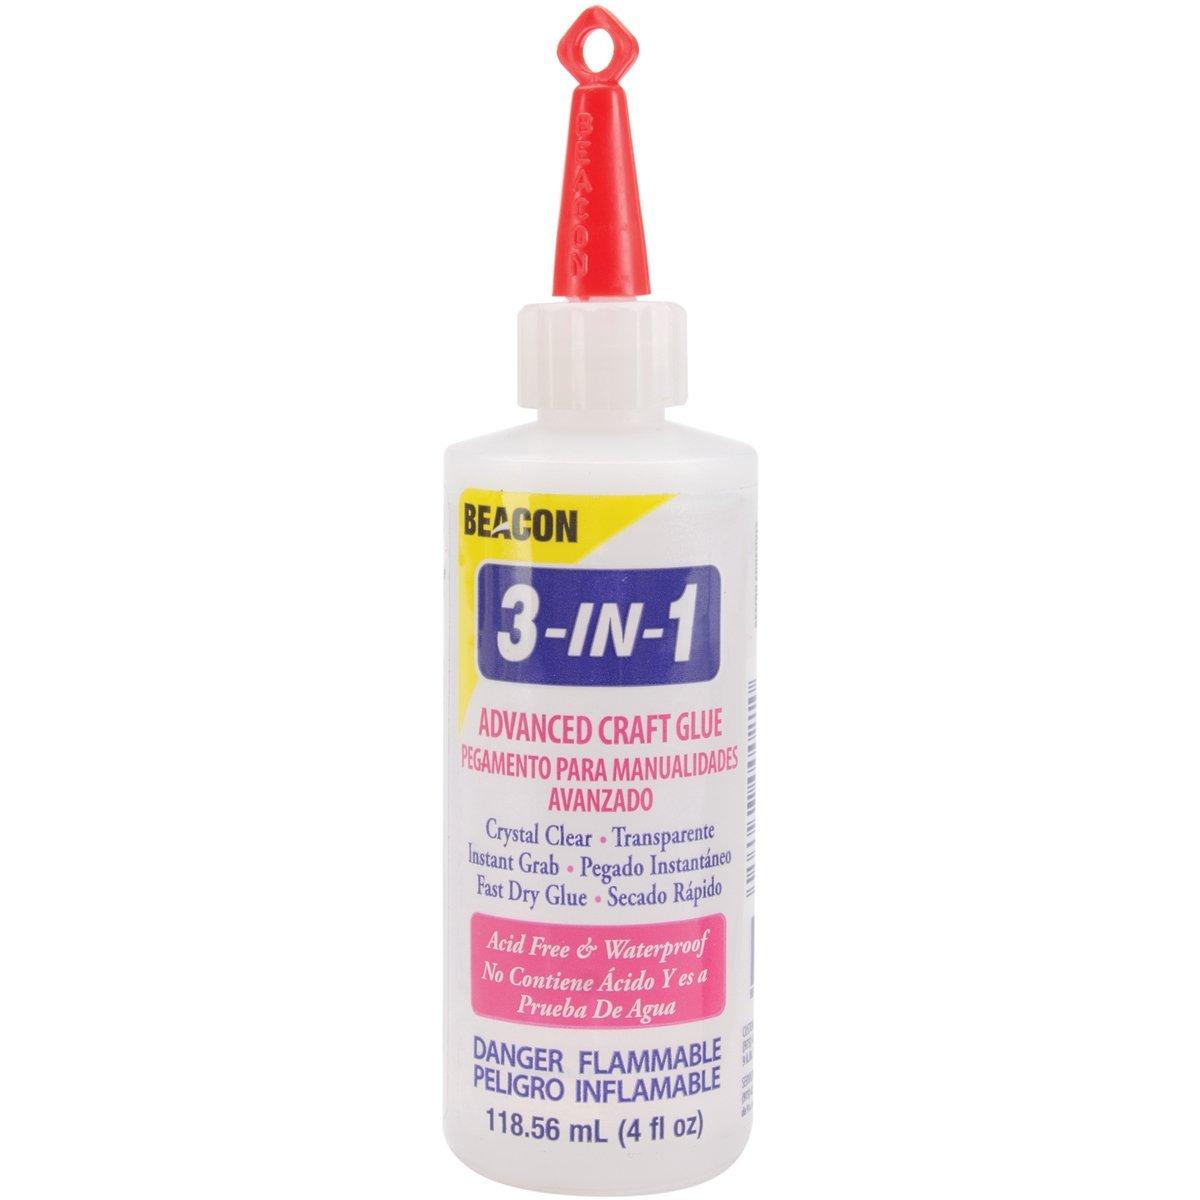 3-in-1 Advanced Craft Glue 118.56ml Medium Bottle, Clear Beacon Adhesives 314OZ